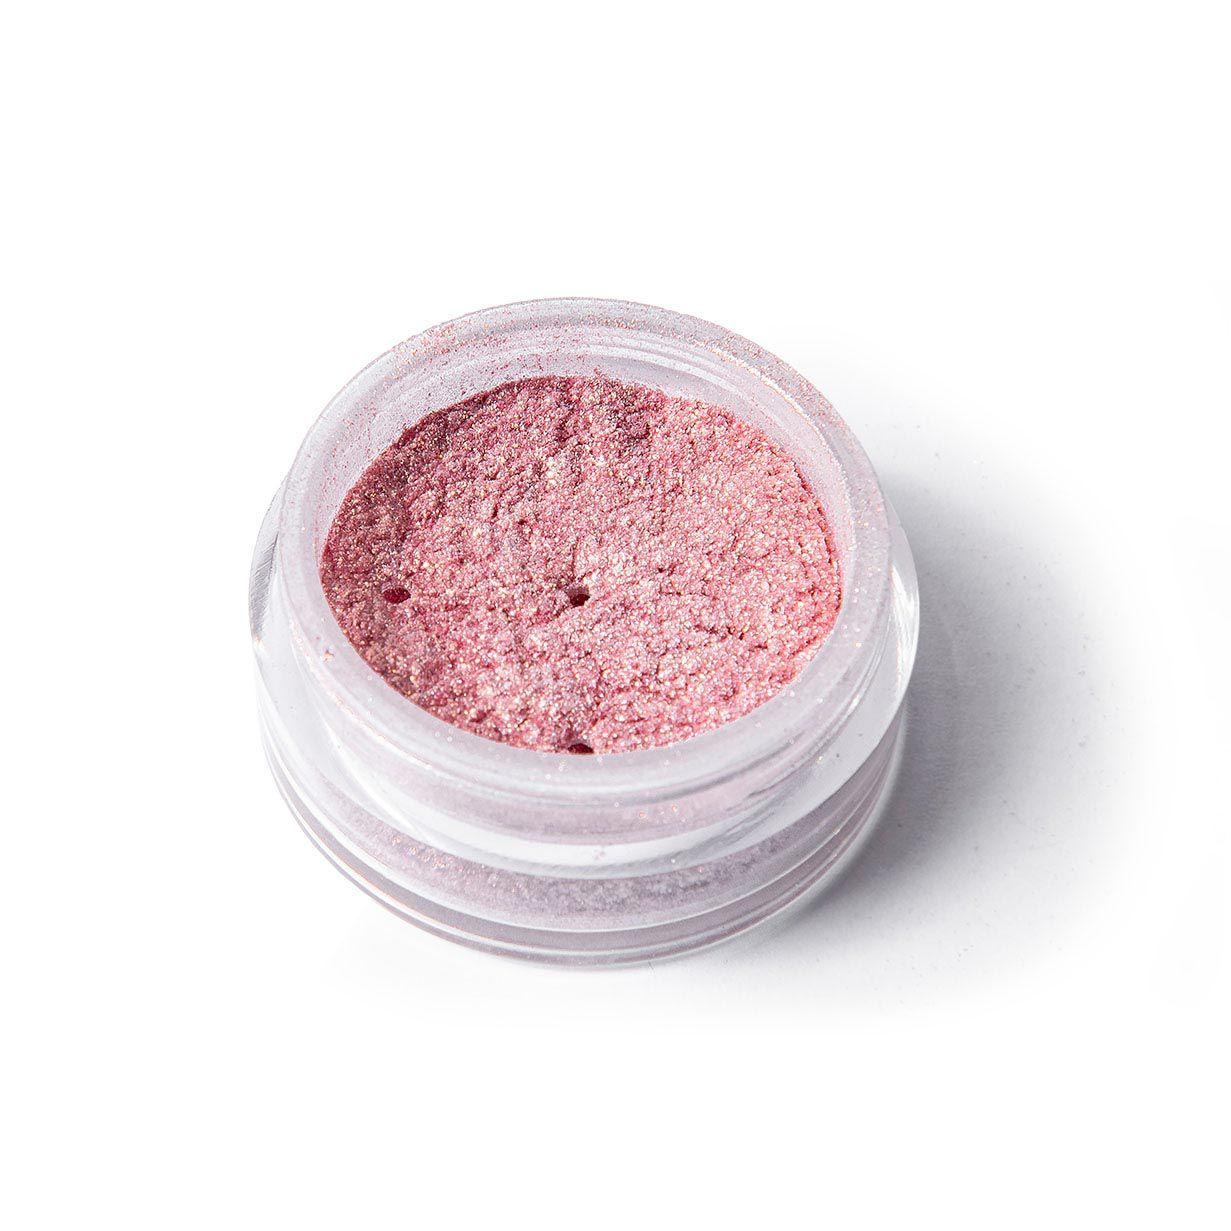 Asa de Borboleta Pigmento Suelen Makeup Veneza